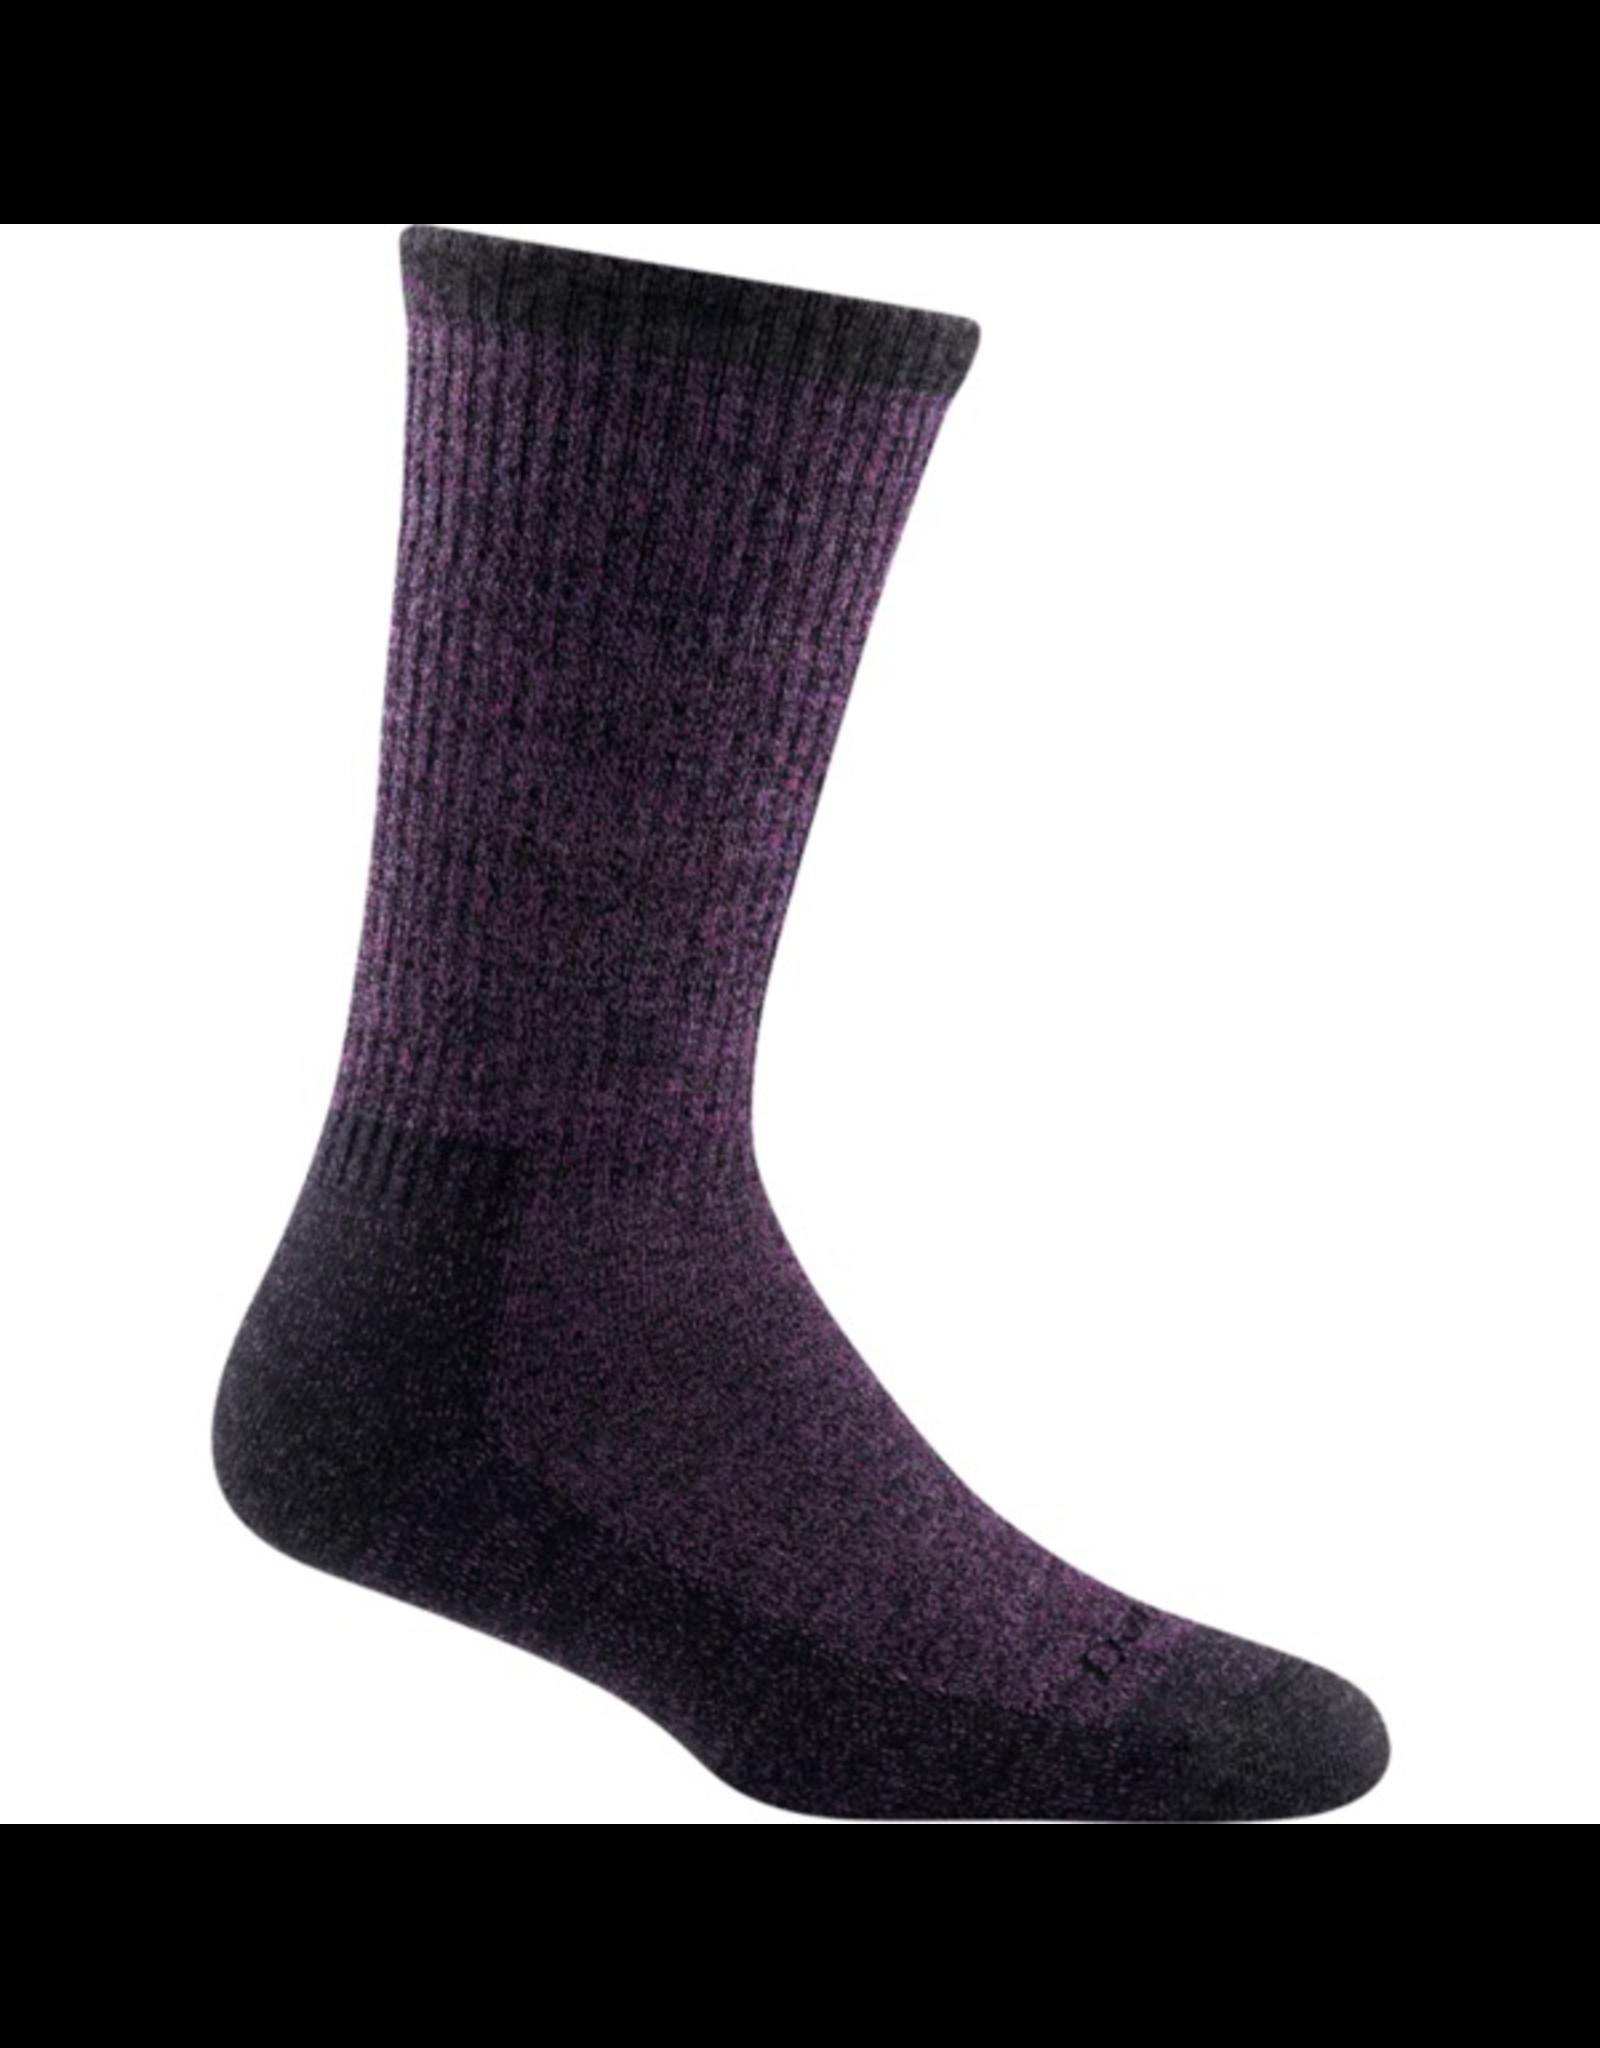 Darn Tough Darn Tough Womens Hike/Trek Nomad Boot Midweight Full Cushion Sock